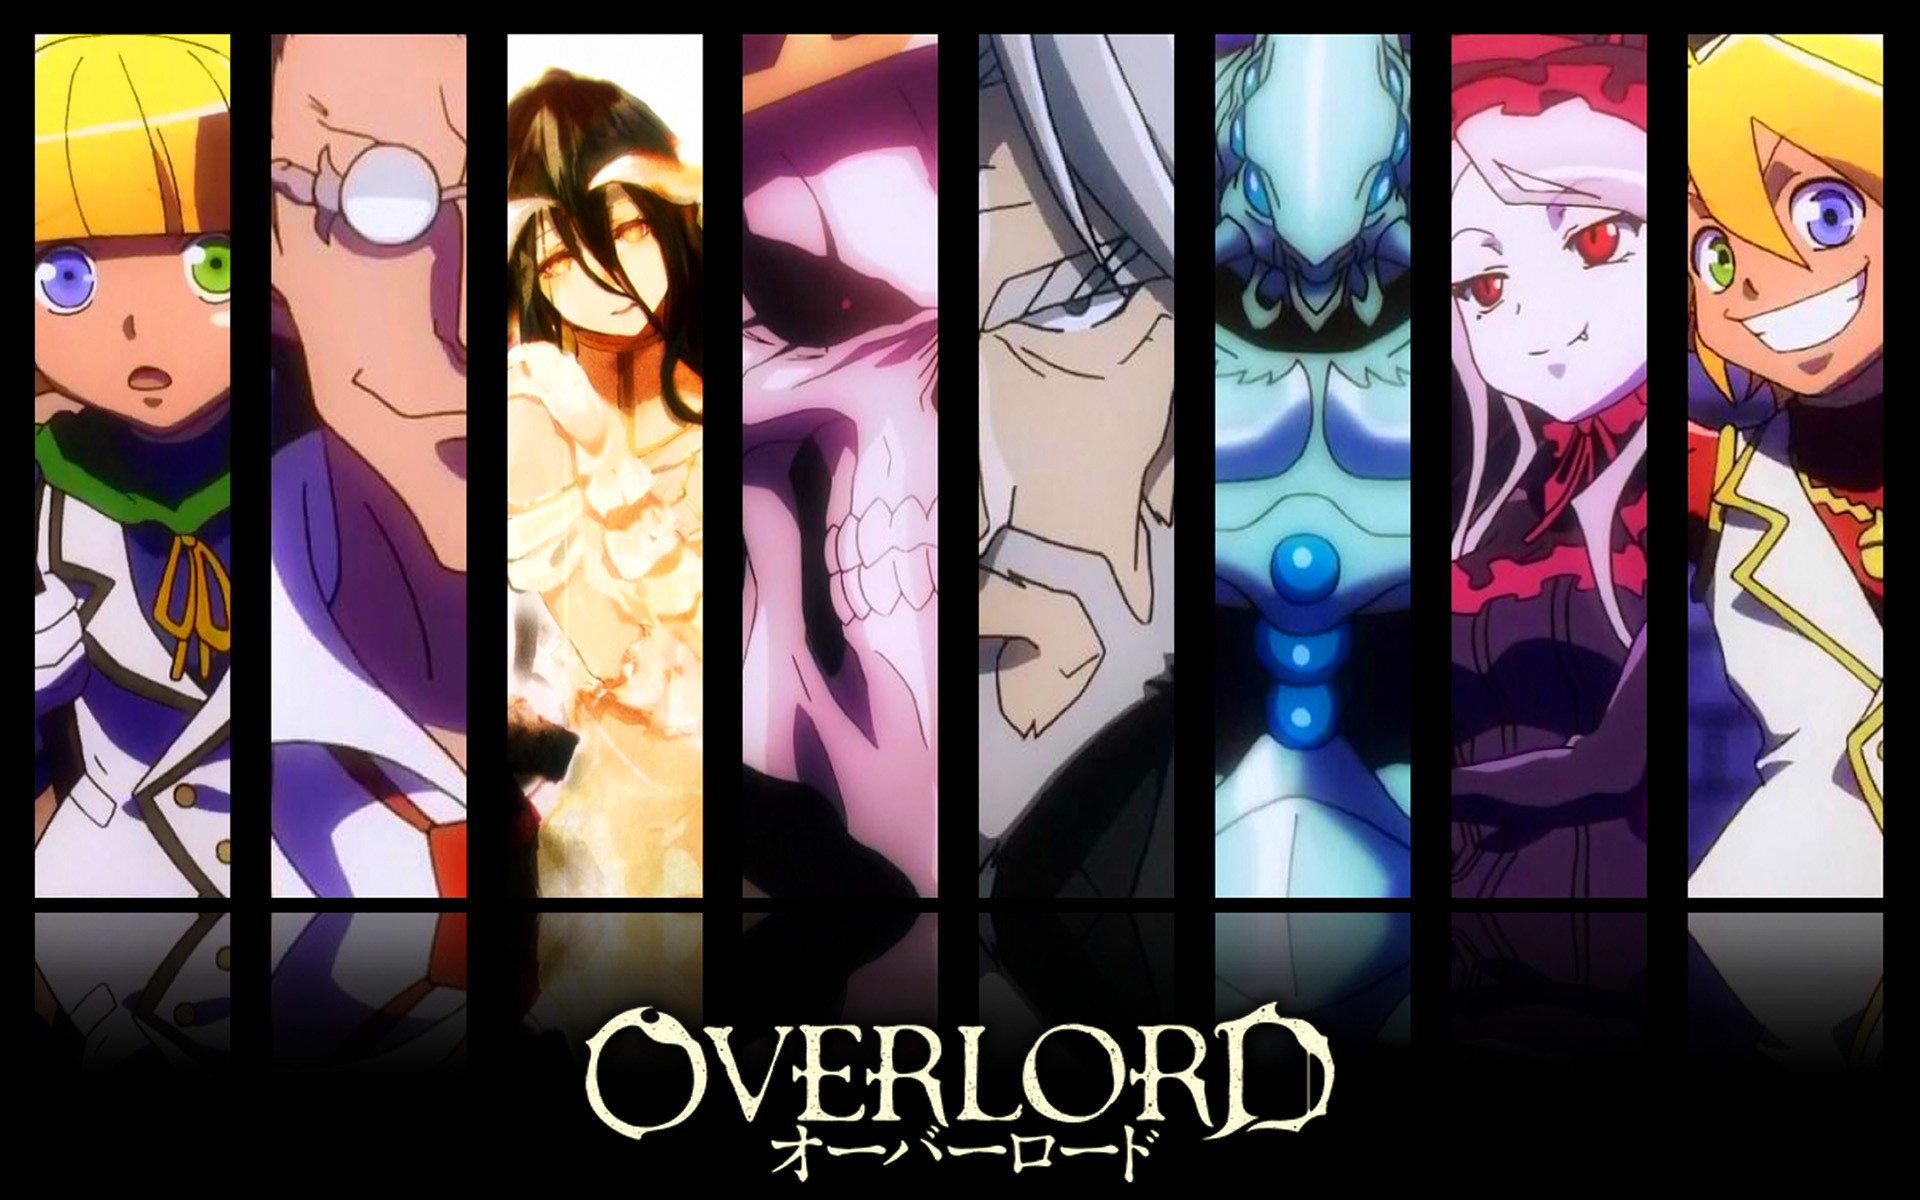 Anime – Overlord Overlord (Anime) Mare Bello Fiore Aura Bella Fiora  Shalltear Bloodfallen Demiurge